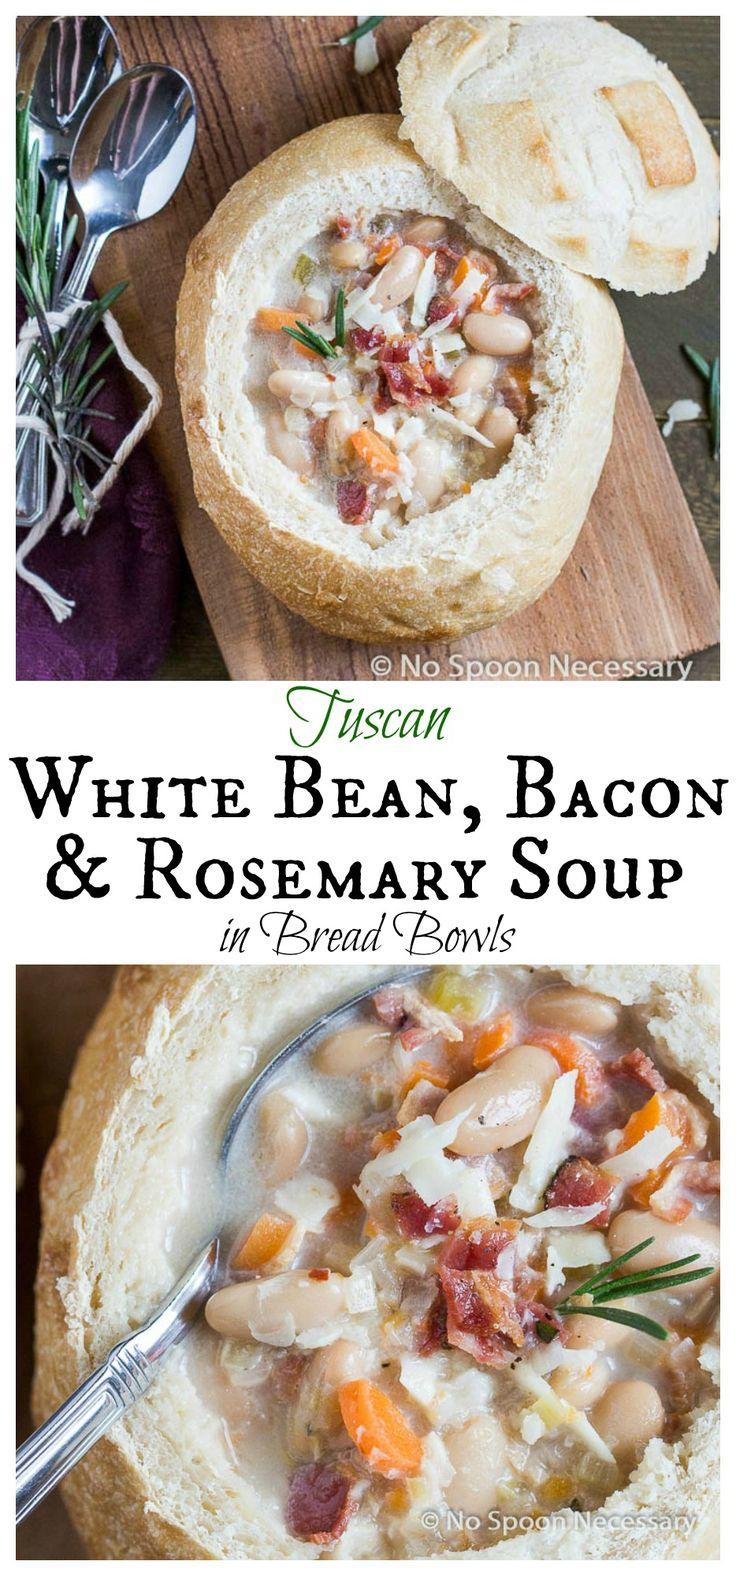 Best 25+ Bread bowl recipes ideas on Pinterest   Homemade ...